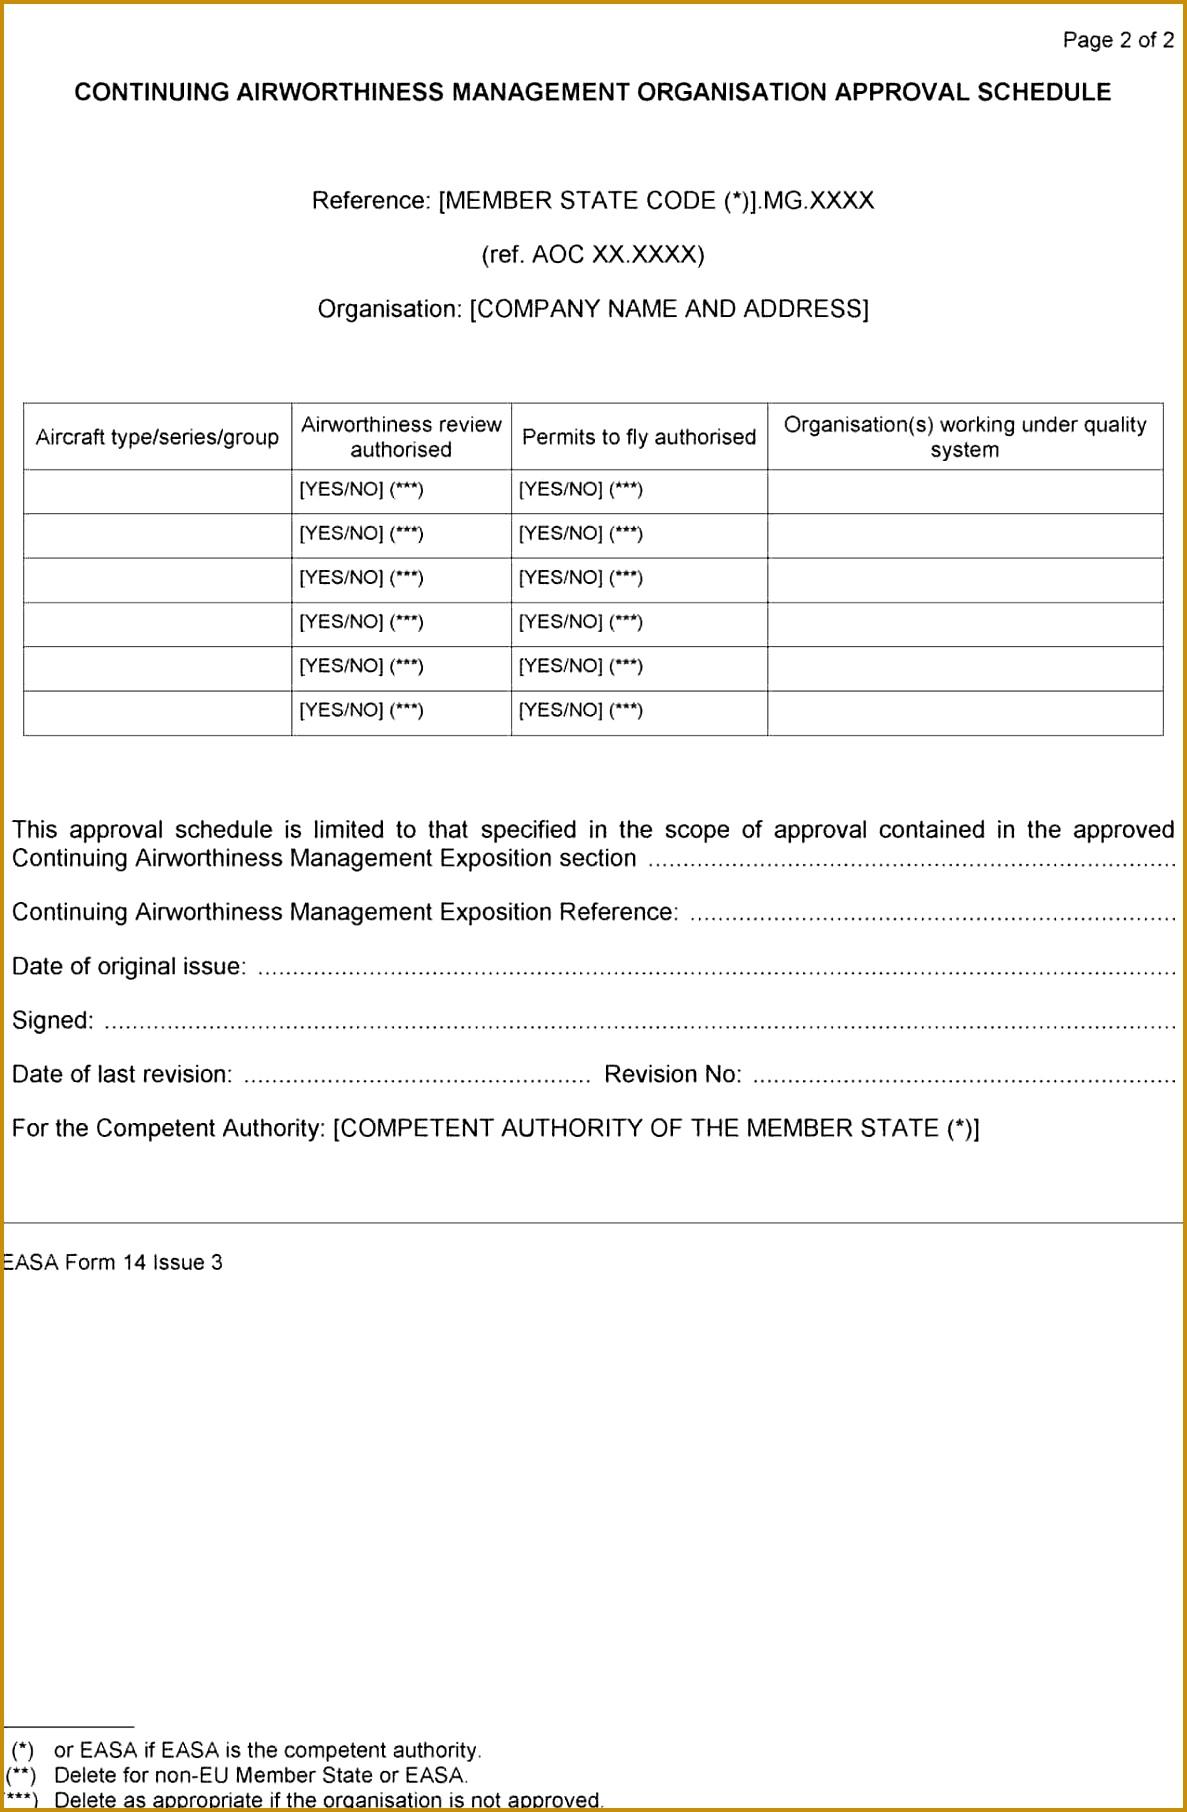 7 Electron Configuration Worksheet Answers